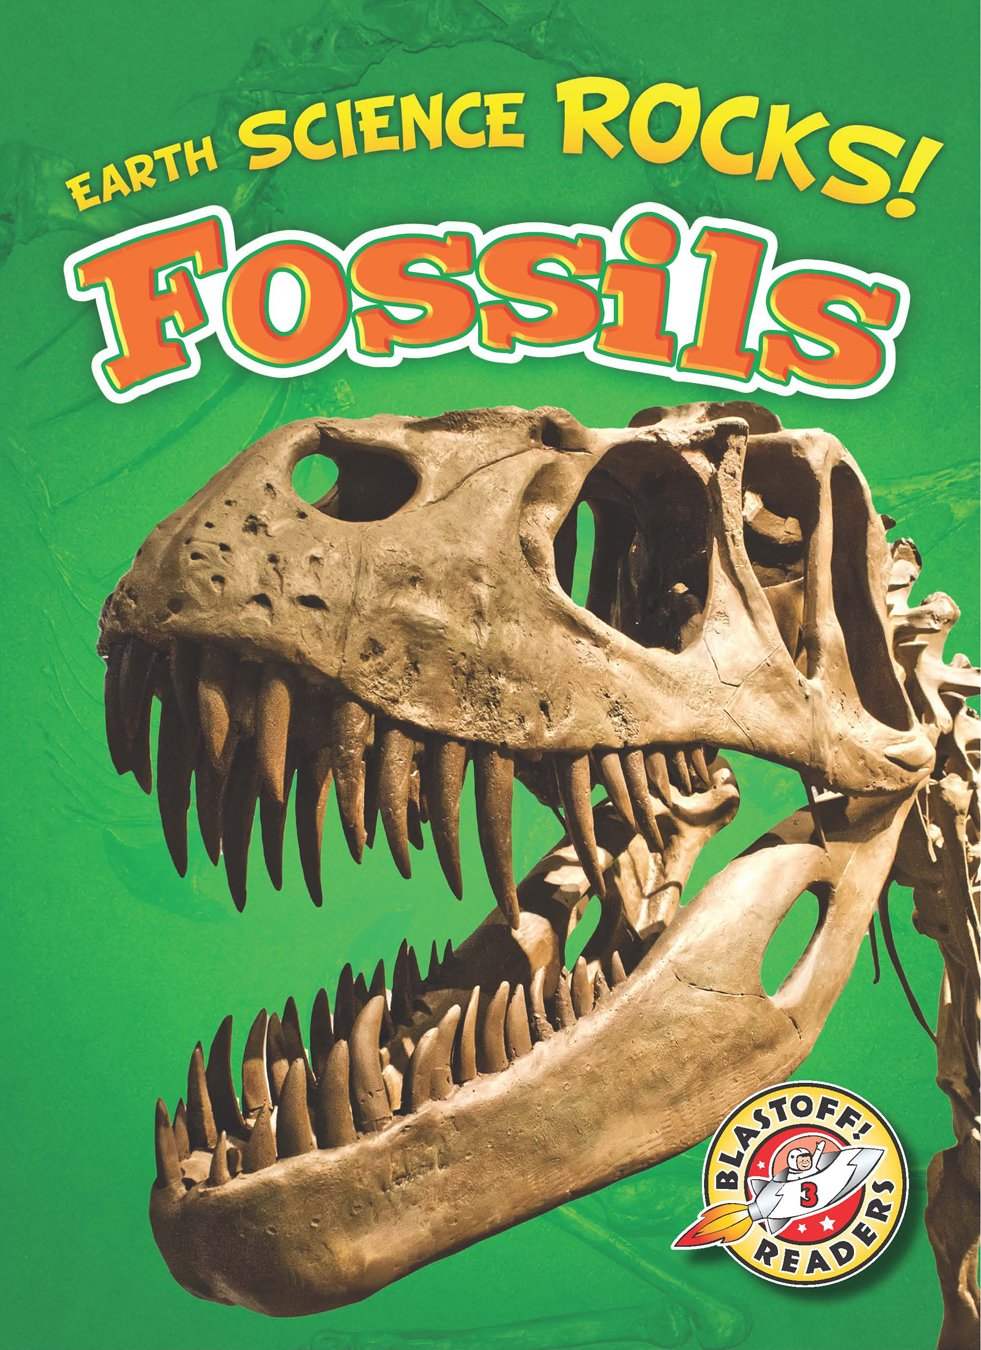 Download Fossils (Blastoff! Readers: Earth Science Rocks!) (Blastoff! Readers, Level 3: Earth Science Rocks!) pdf